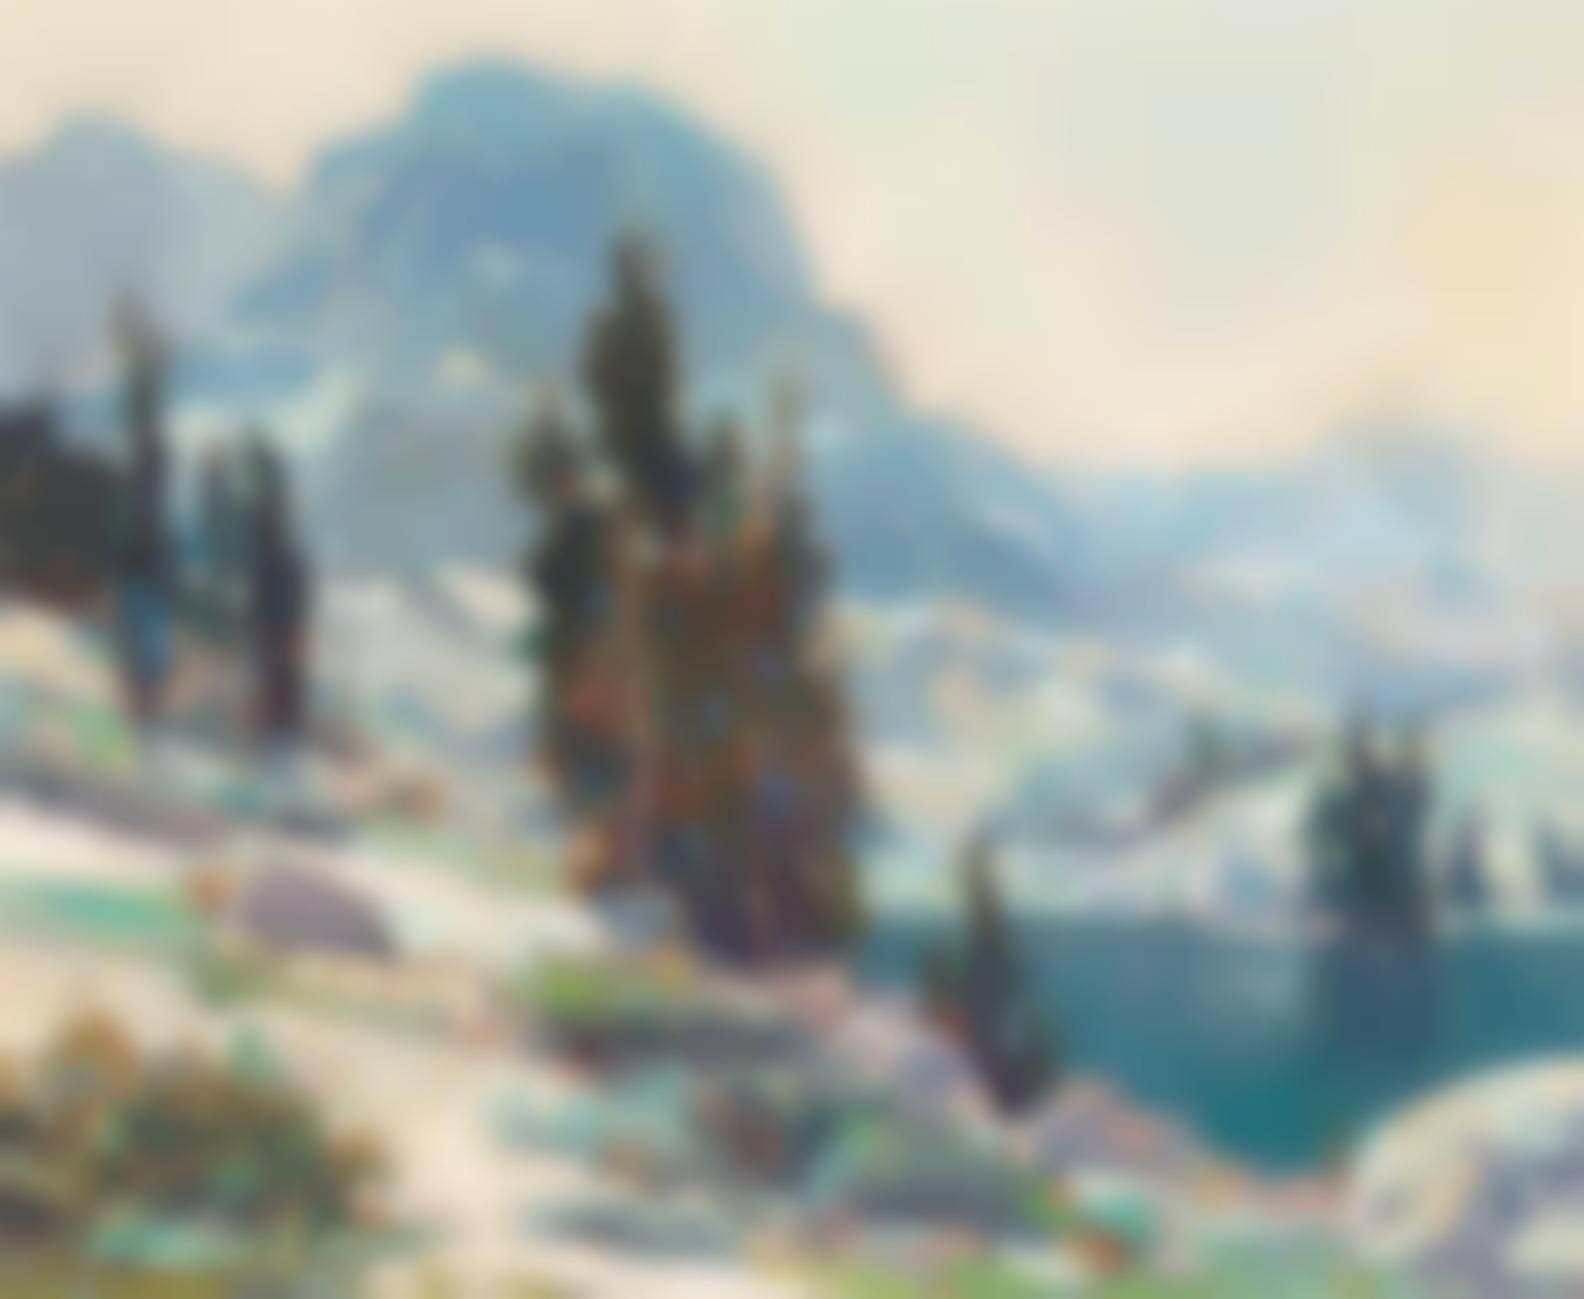 Jack Wilkinson Smith - Mt. Hurd Looking Across South Lake-